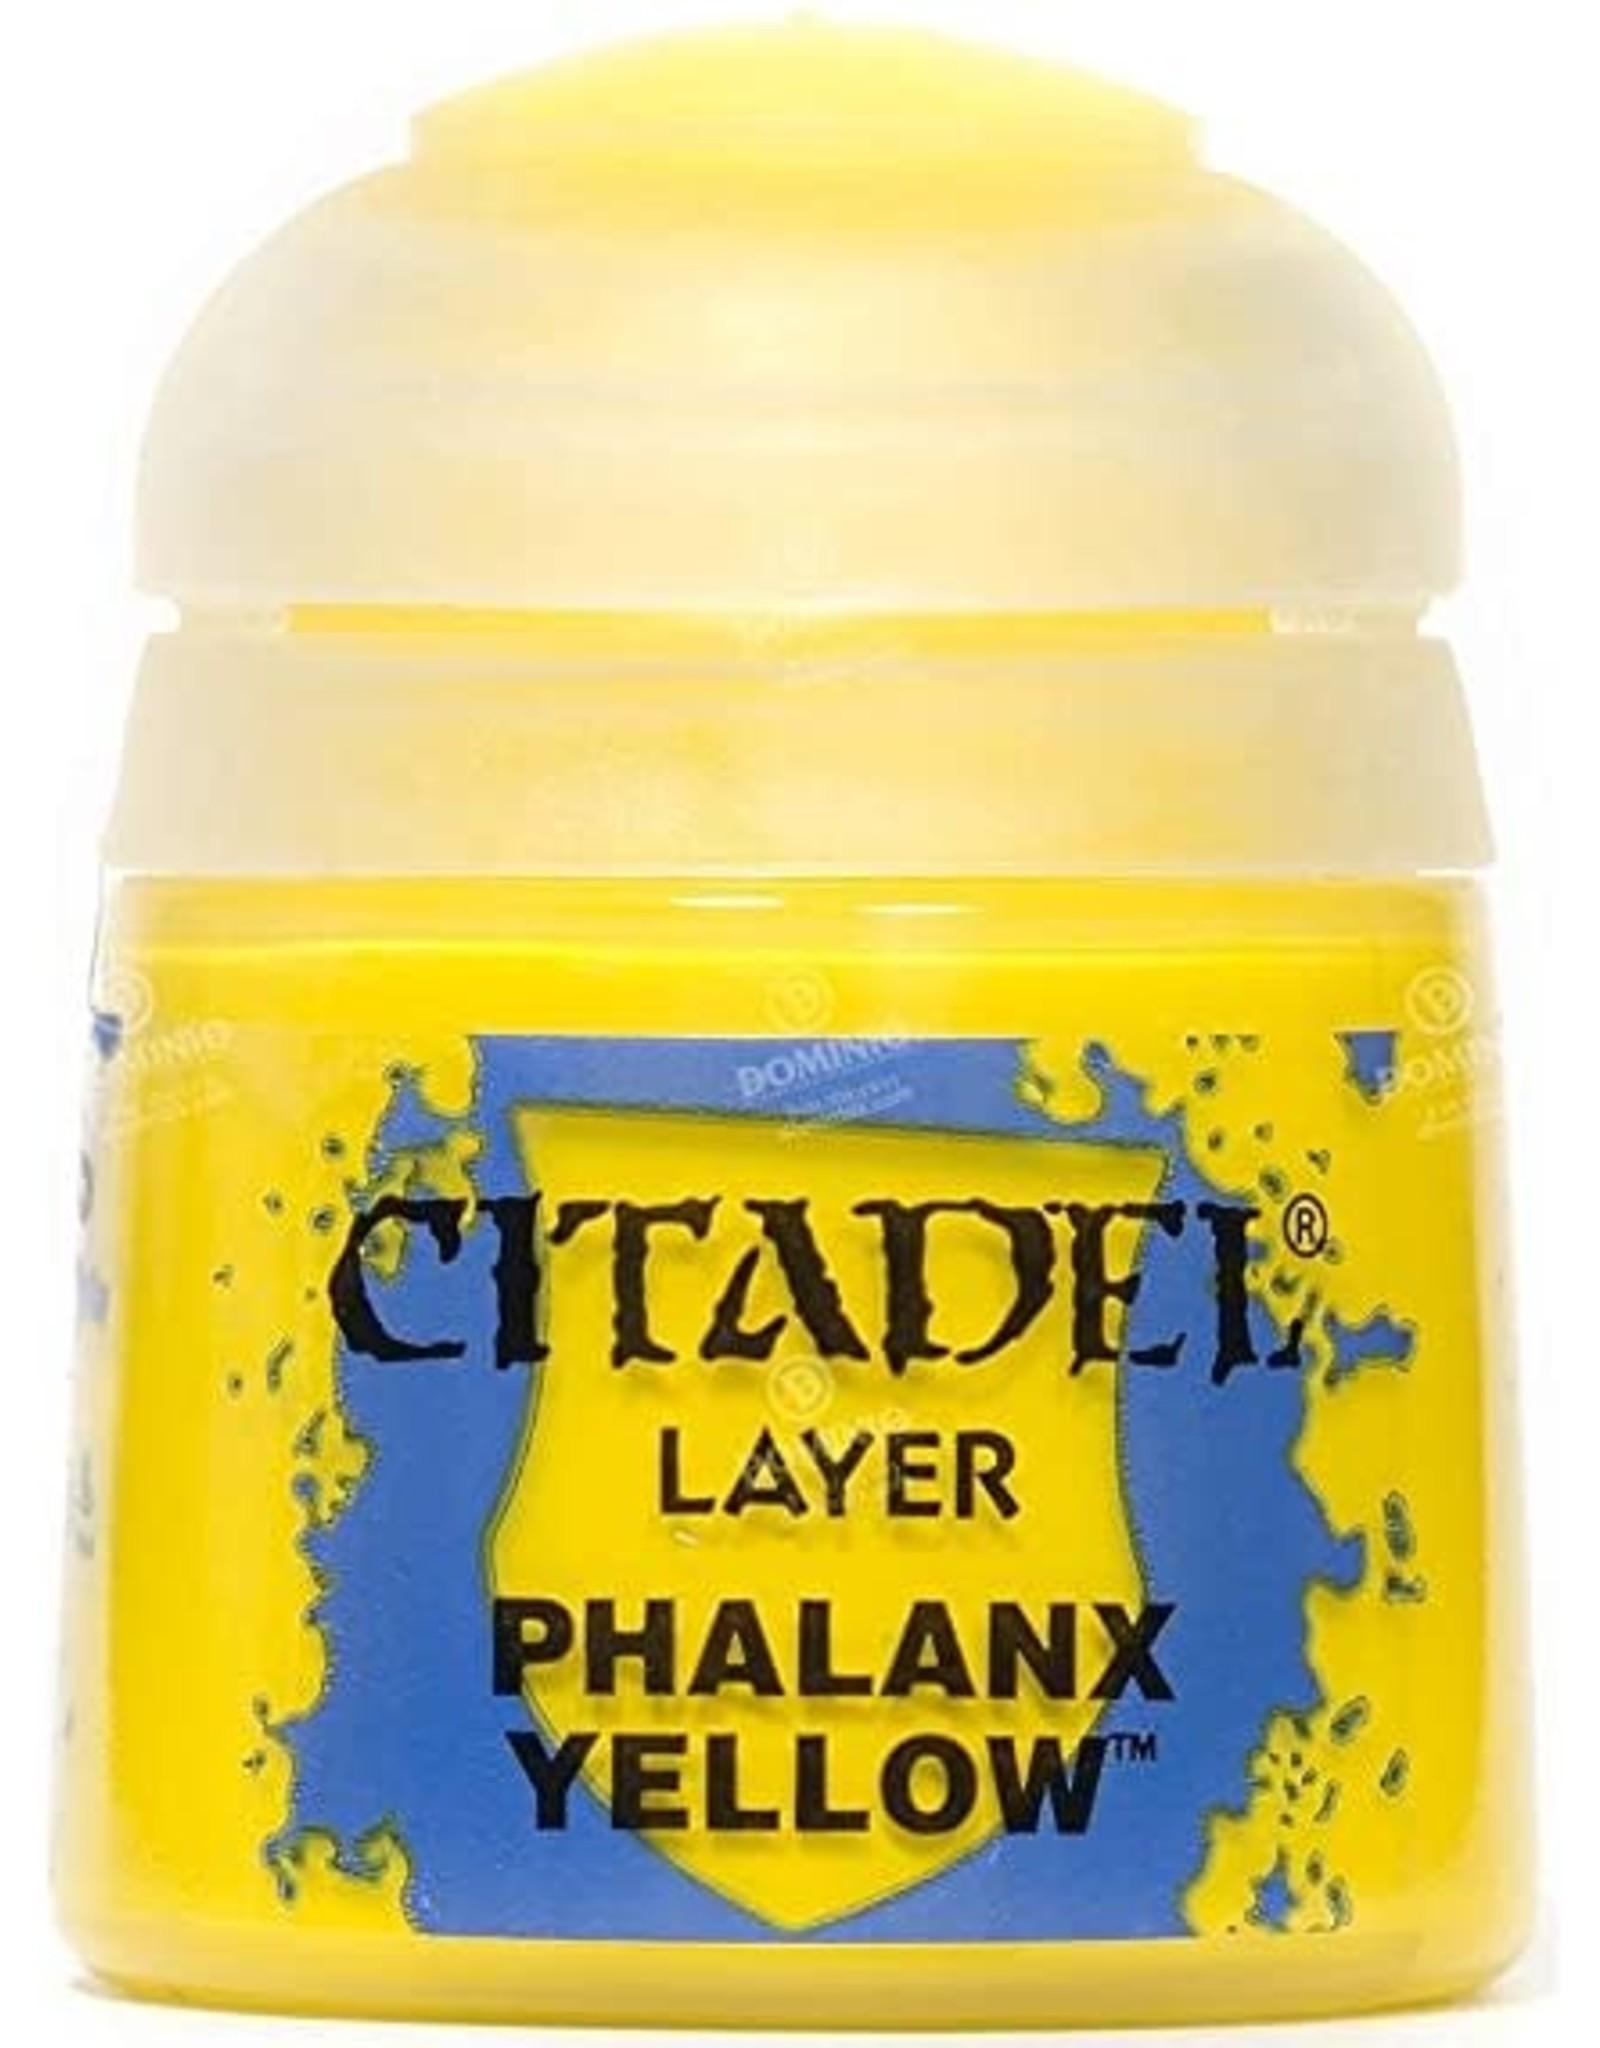 Games Workshop Citadel Paint: Phalanx Yellow 12ml